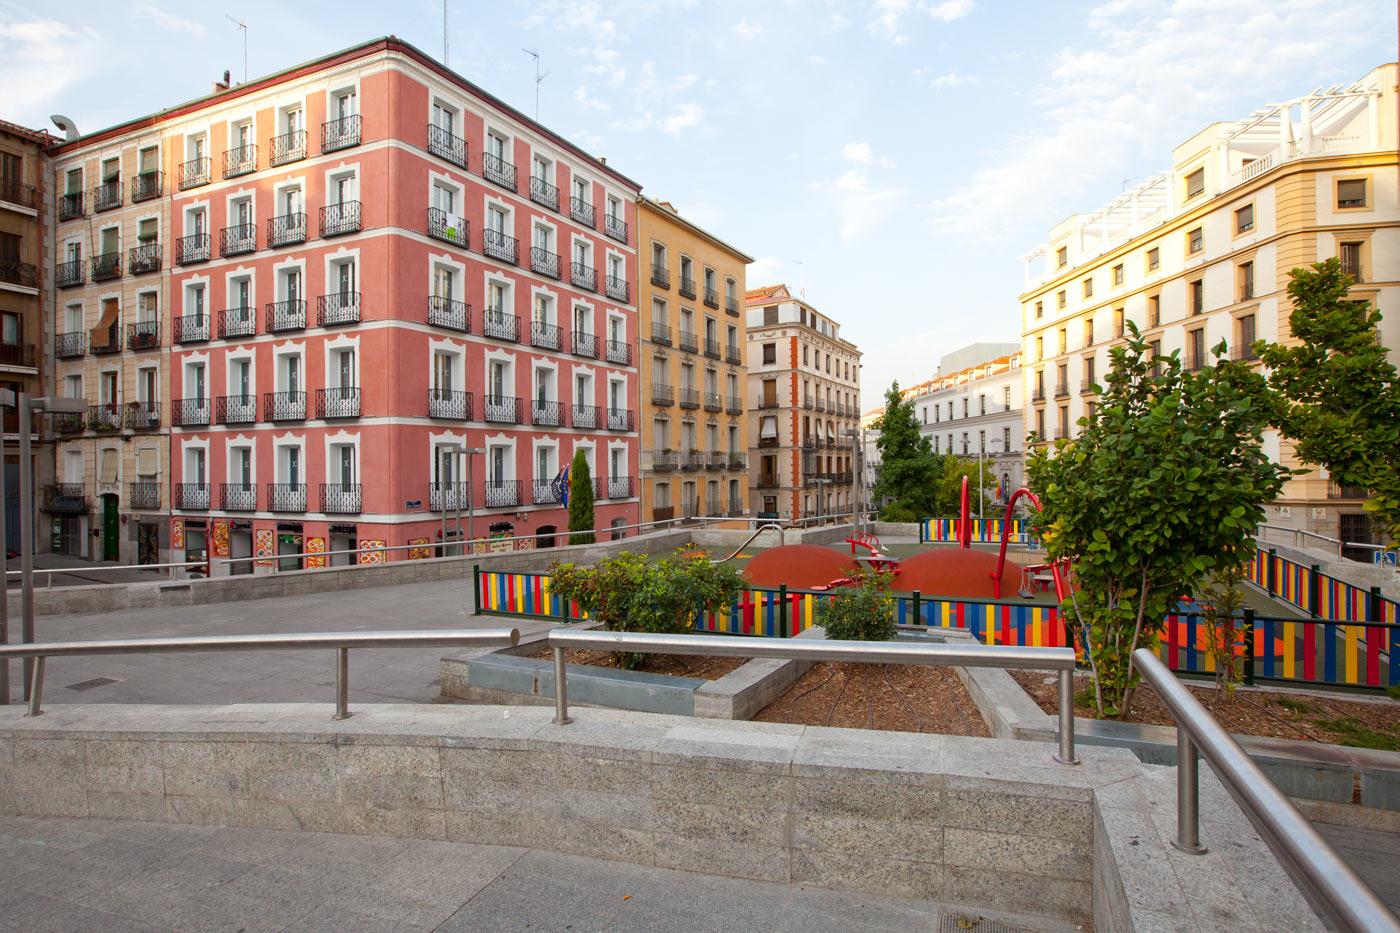 Hotel Jc Santo Domingo Madrid